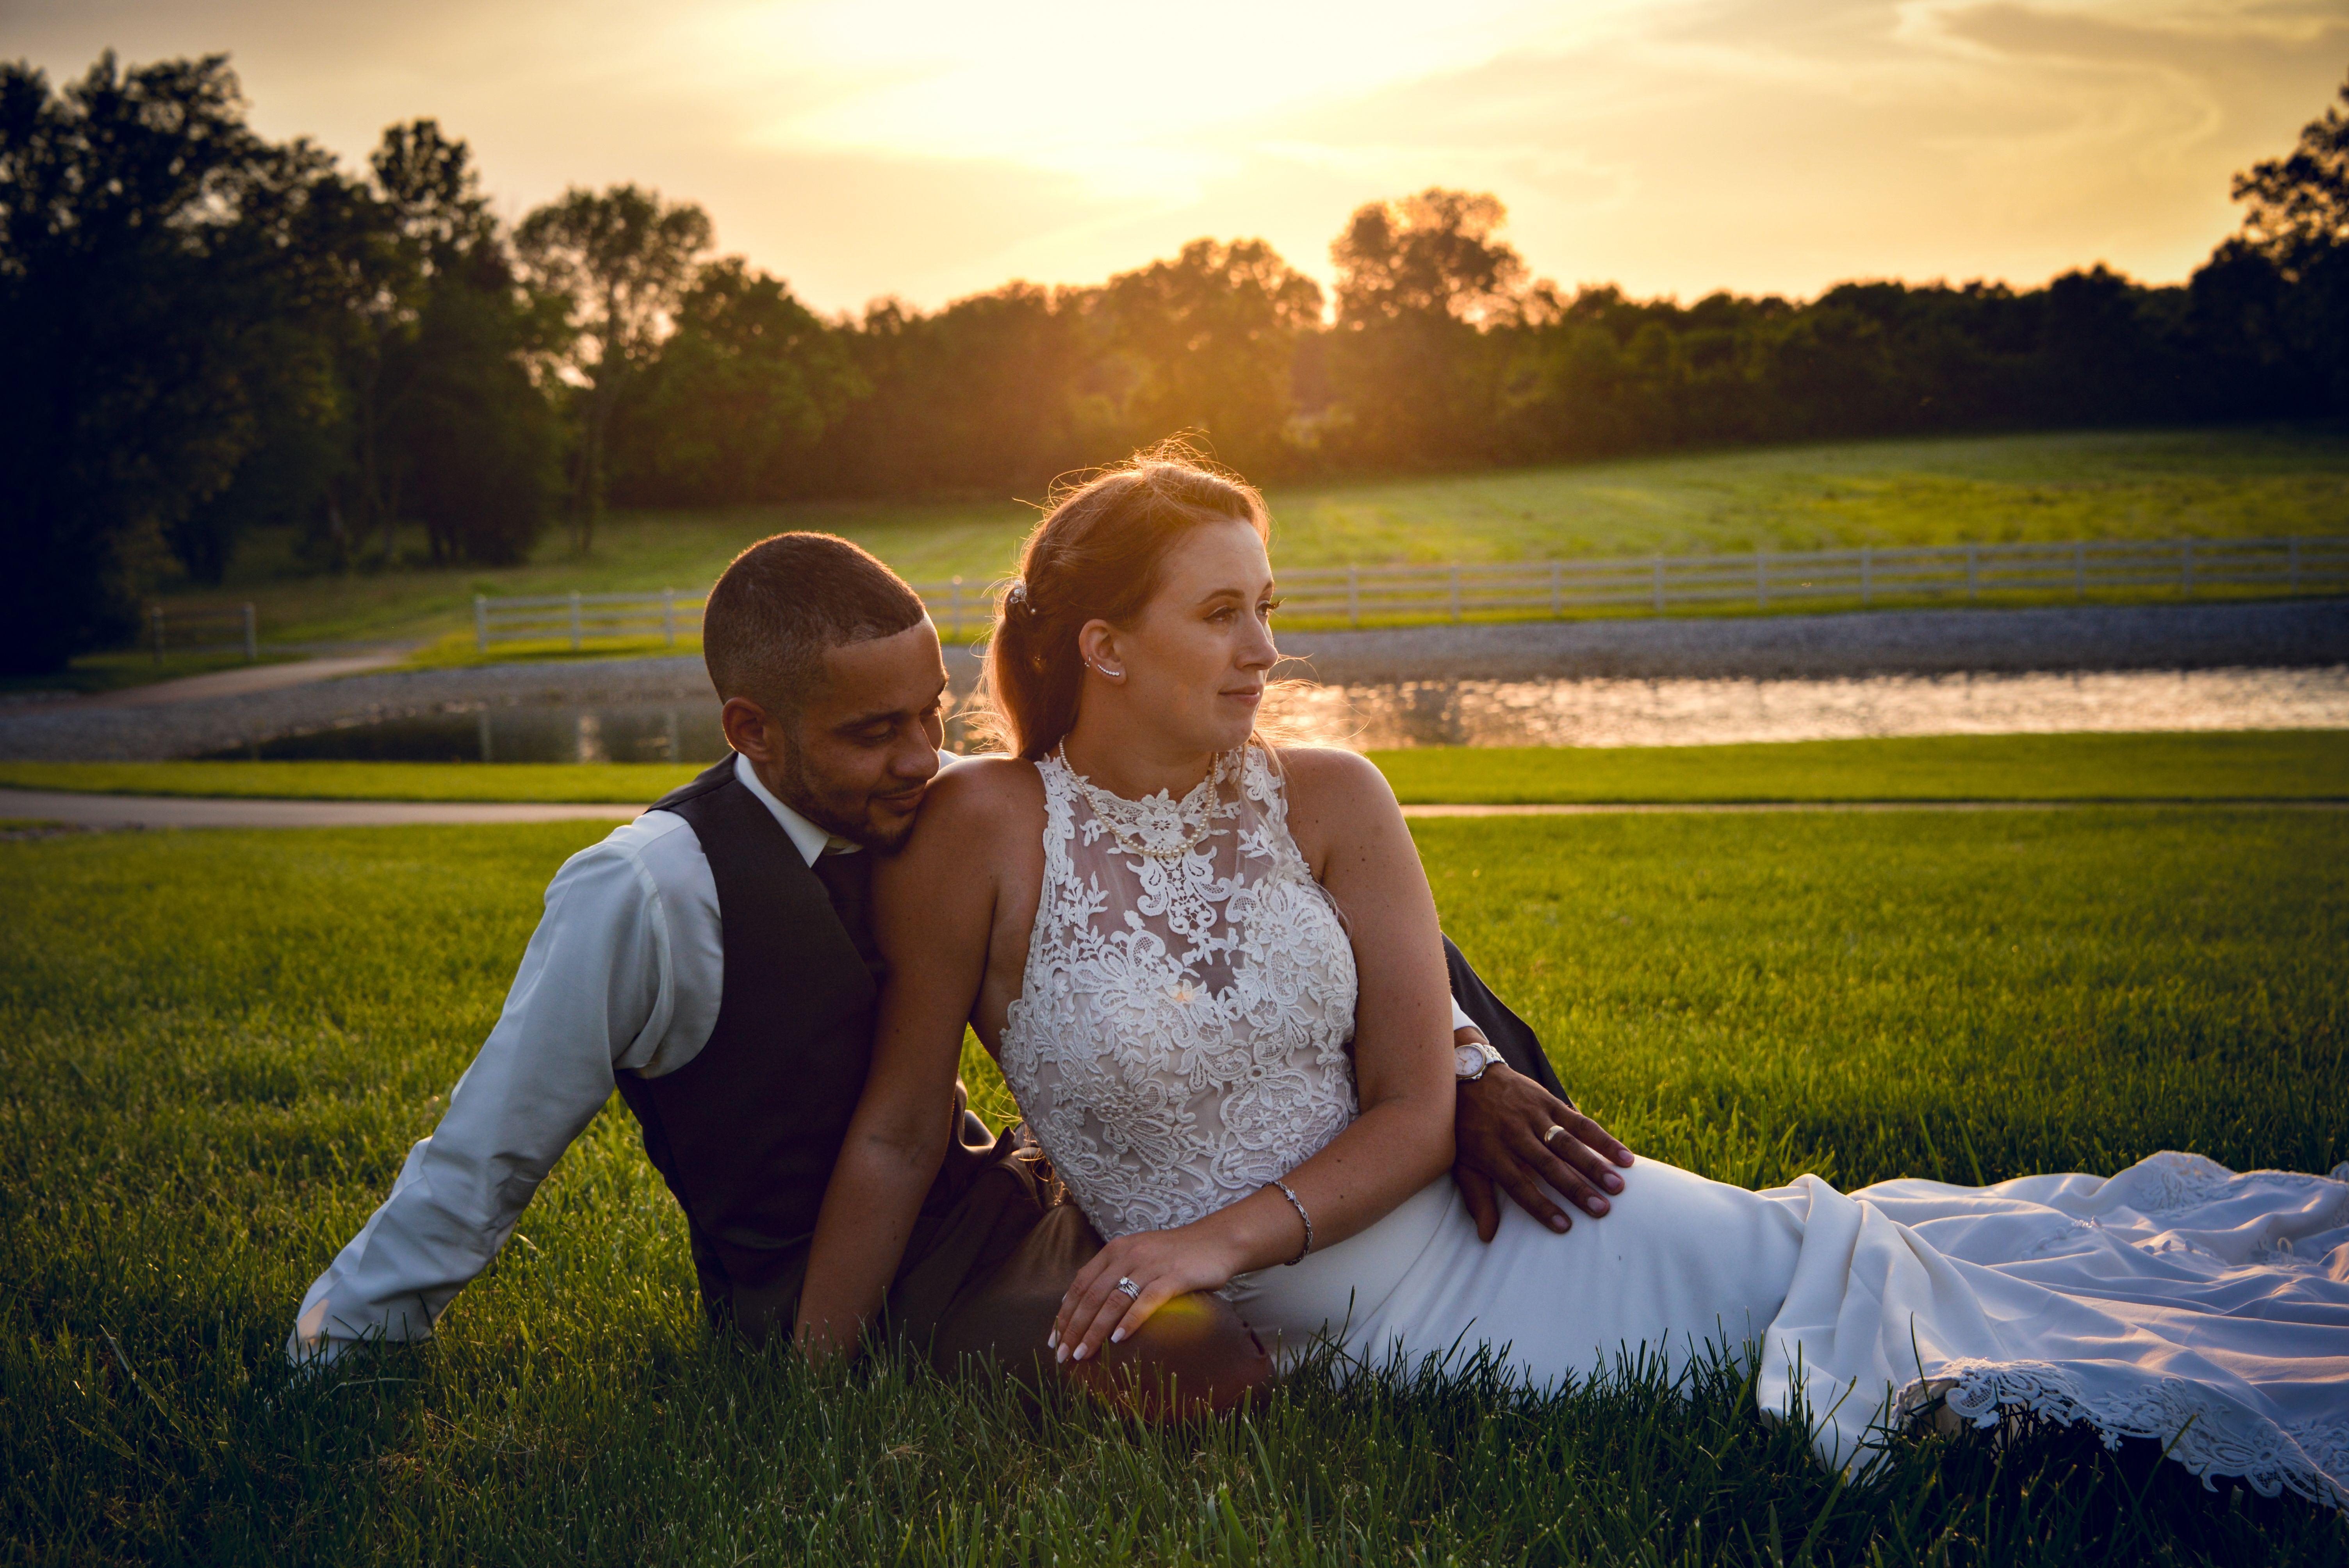 Brigid And Jared A Rolling Meadows Ranch Cincinnati Wedding In 2020 Cincinnati Wedding Photographers Cincinnati Weddings Cincinnati Wedding Photos